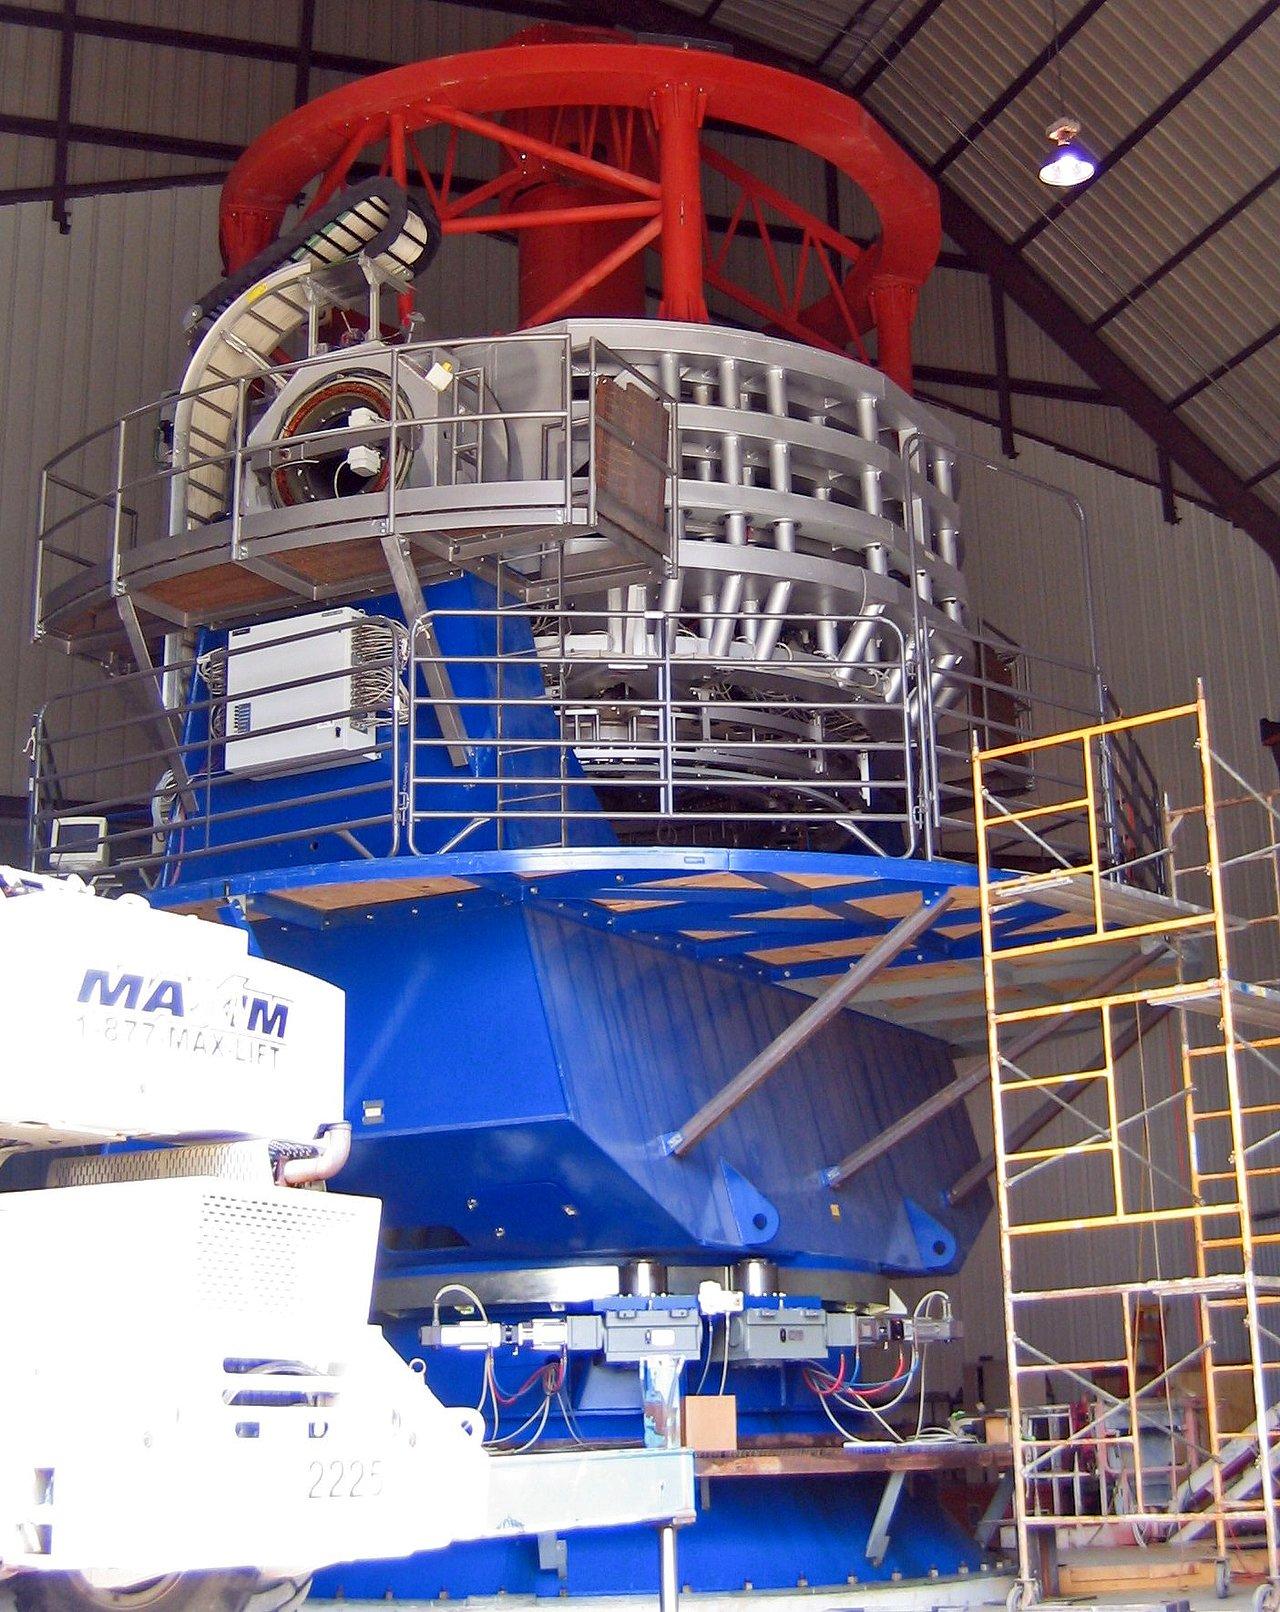 The VISTA telescope under construction